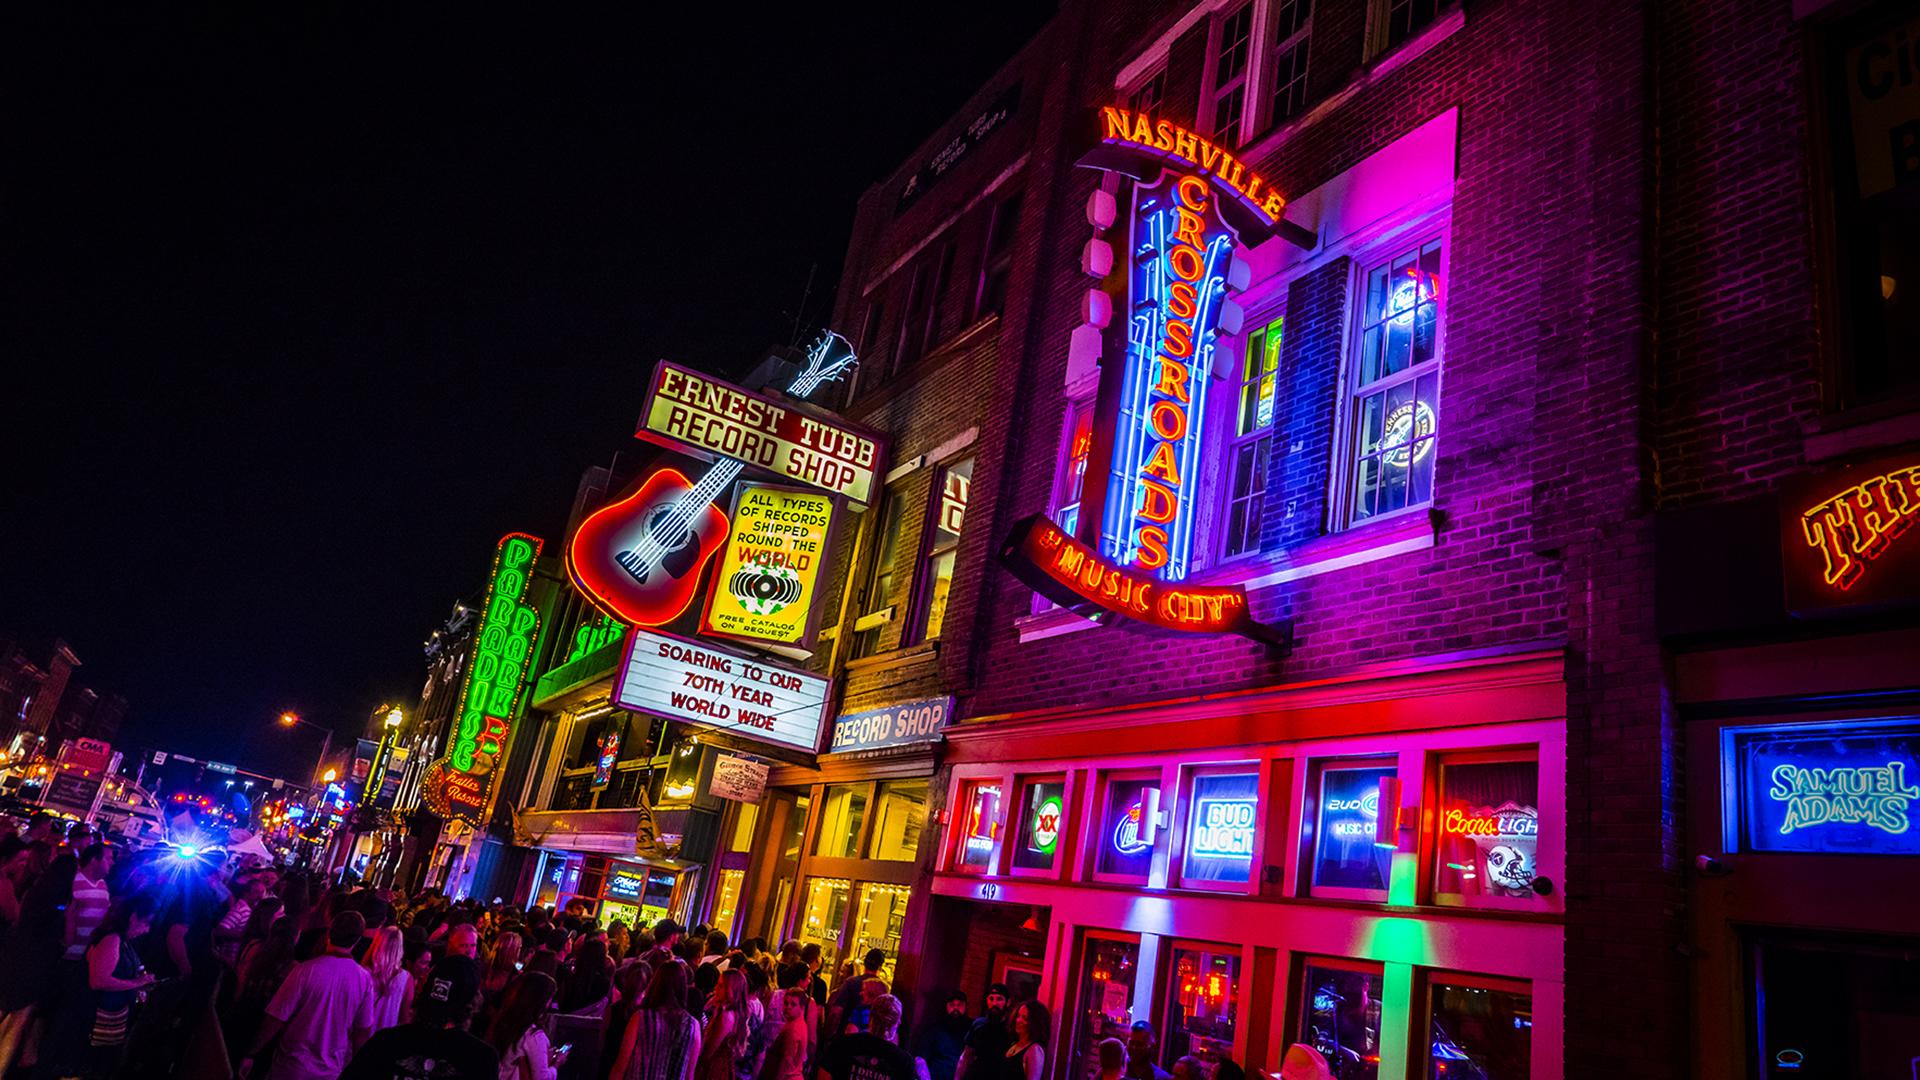 Nashville Had a 'Dark Age' Where Serial Killers Ran Rampant